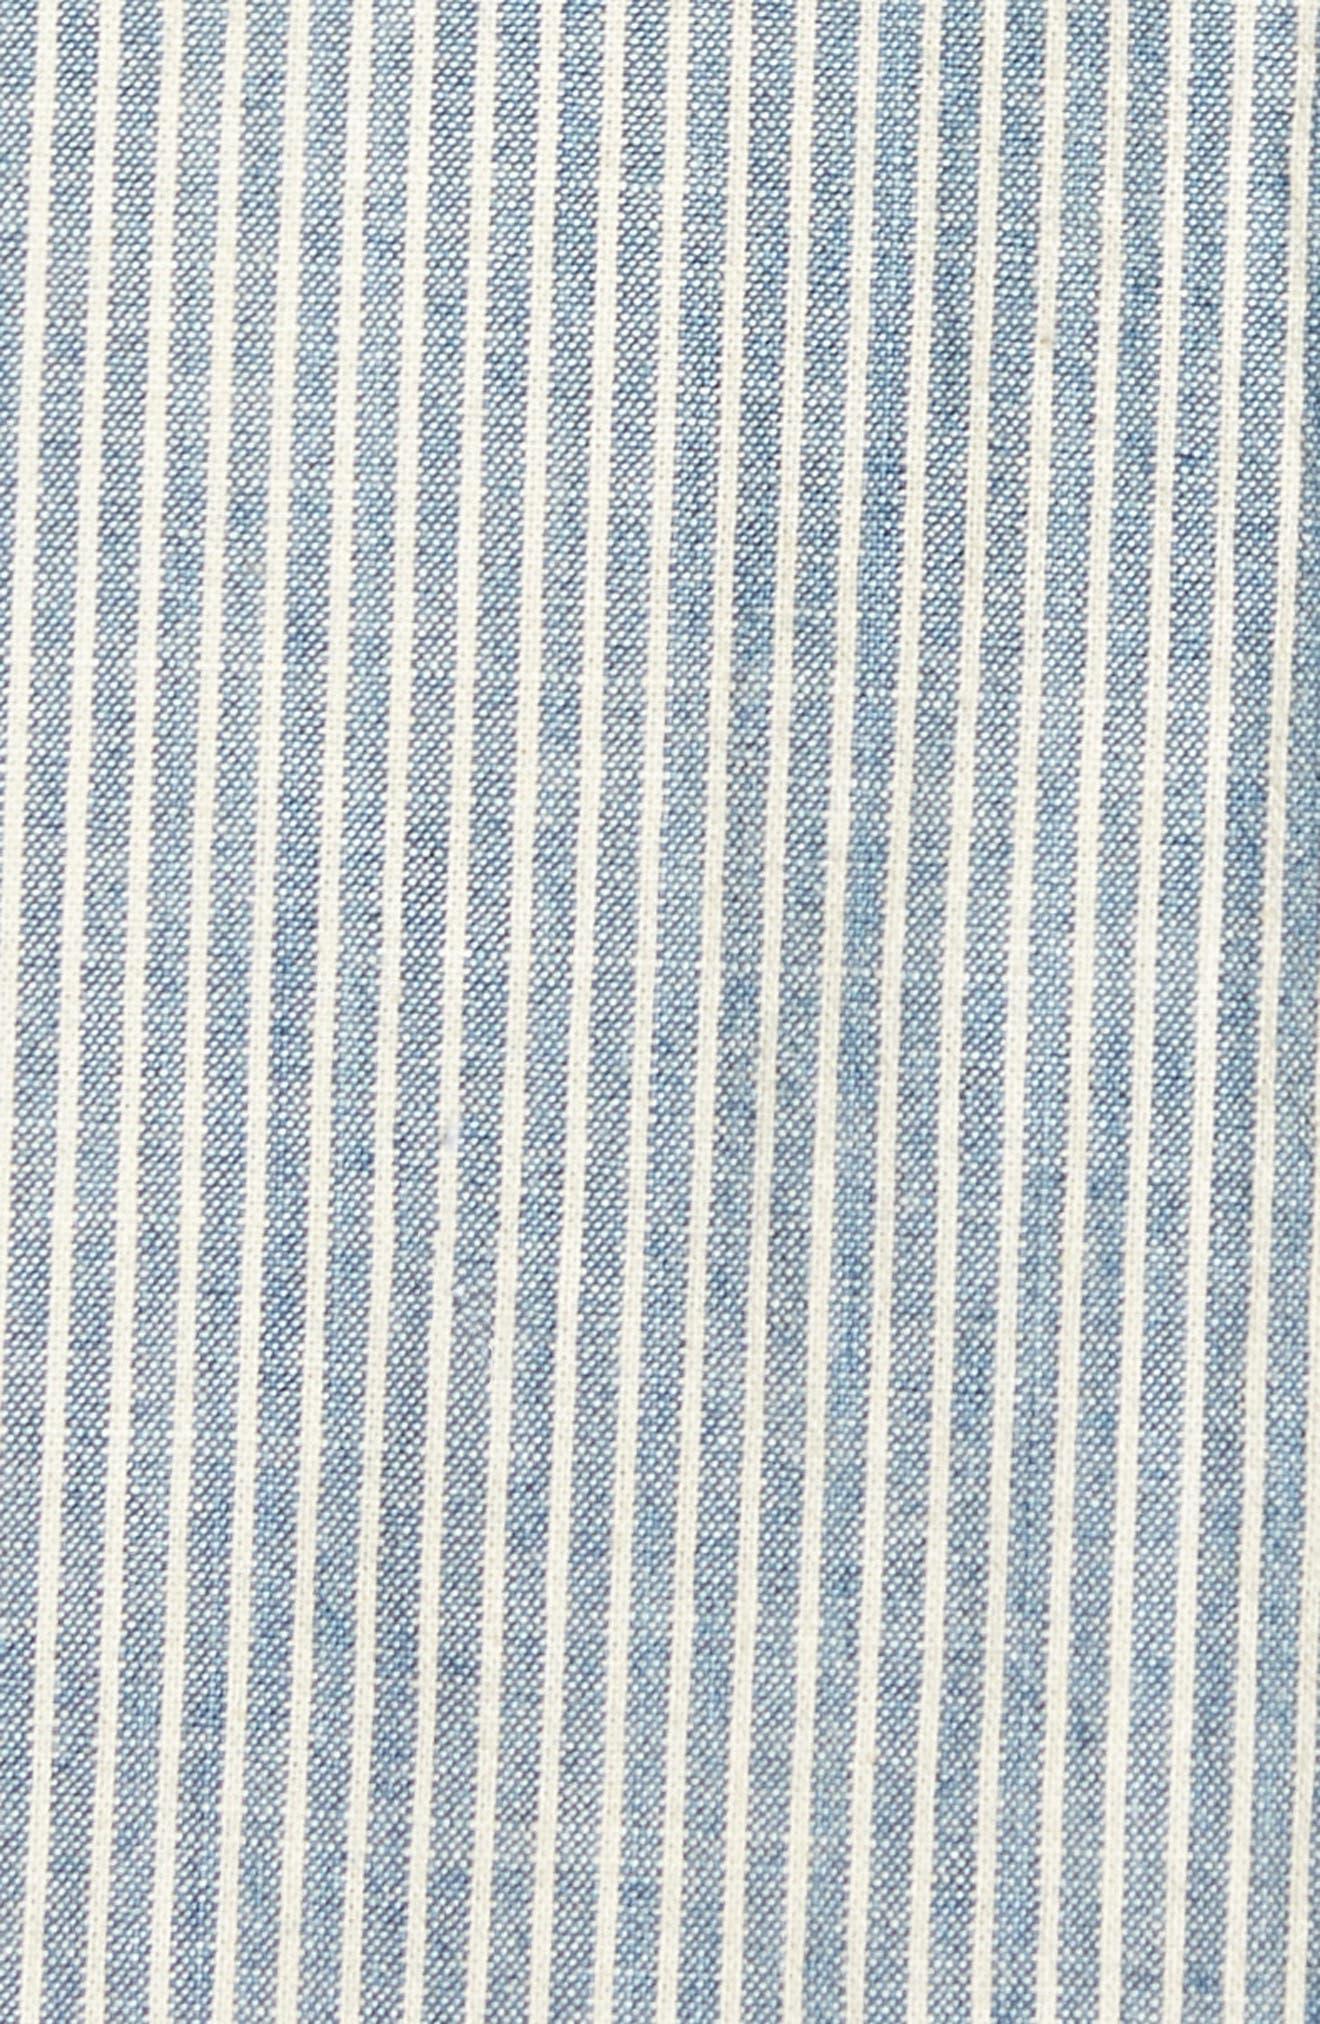 Nelson Slim Fit Stripe Sport Shirt,                             Alternate thumbnail 5, color,                             049